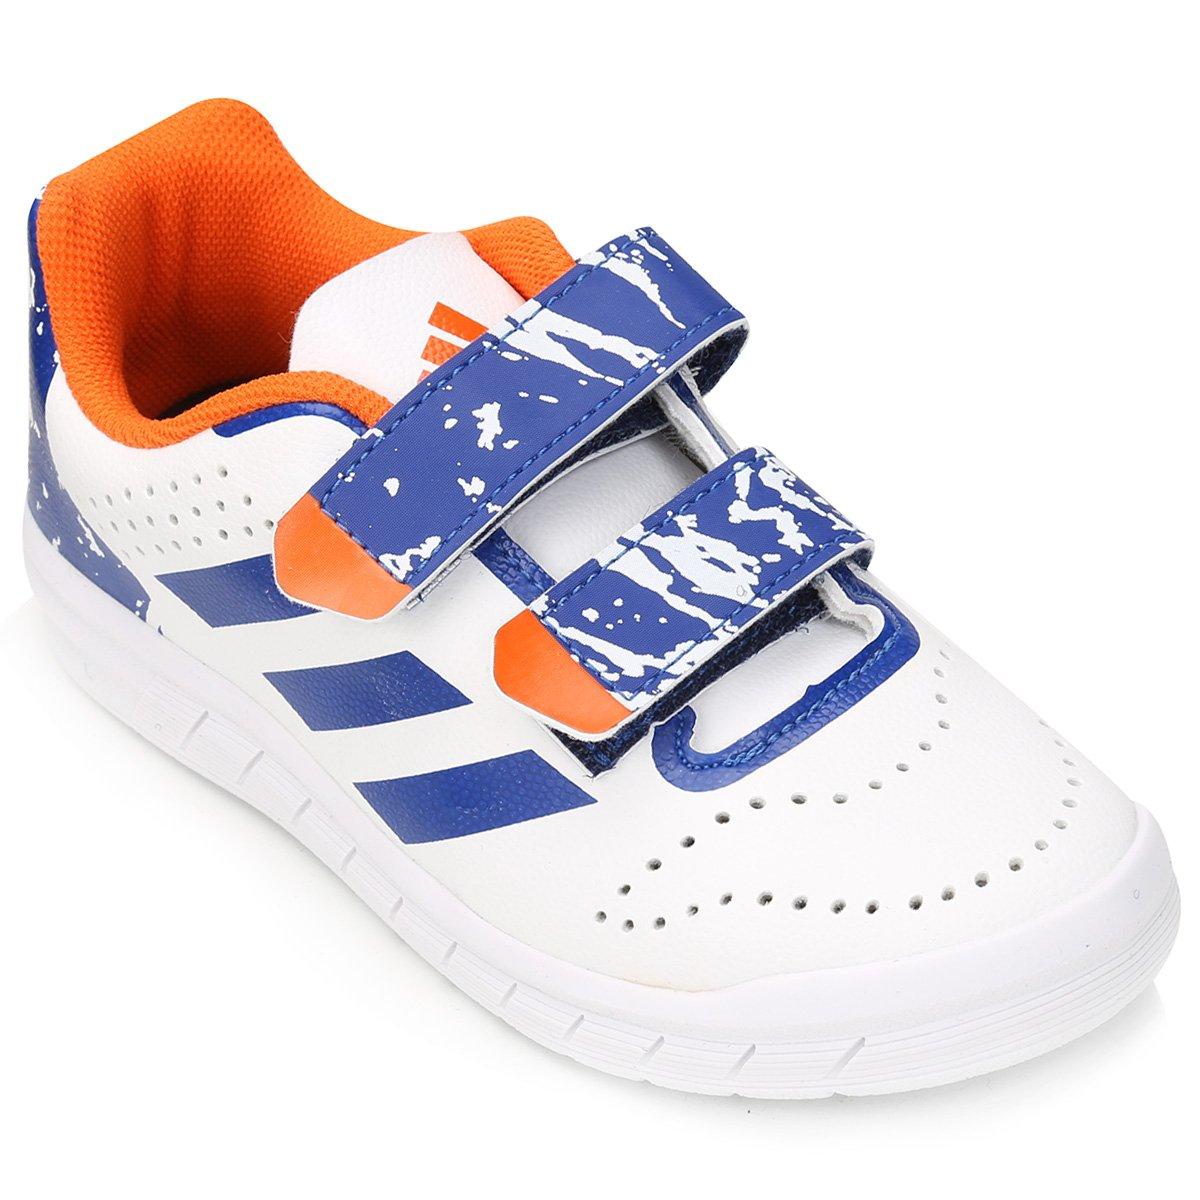 bfd846fdb7a Tênis Infantil Adidas Quicksport Cf C Velcro